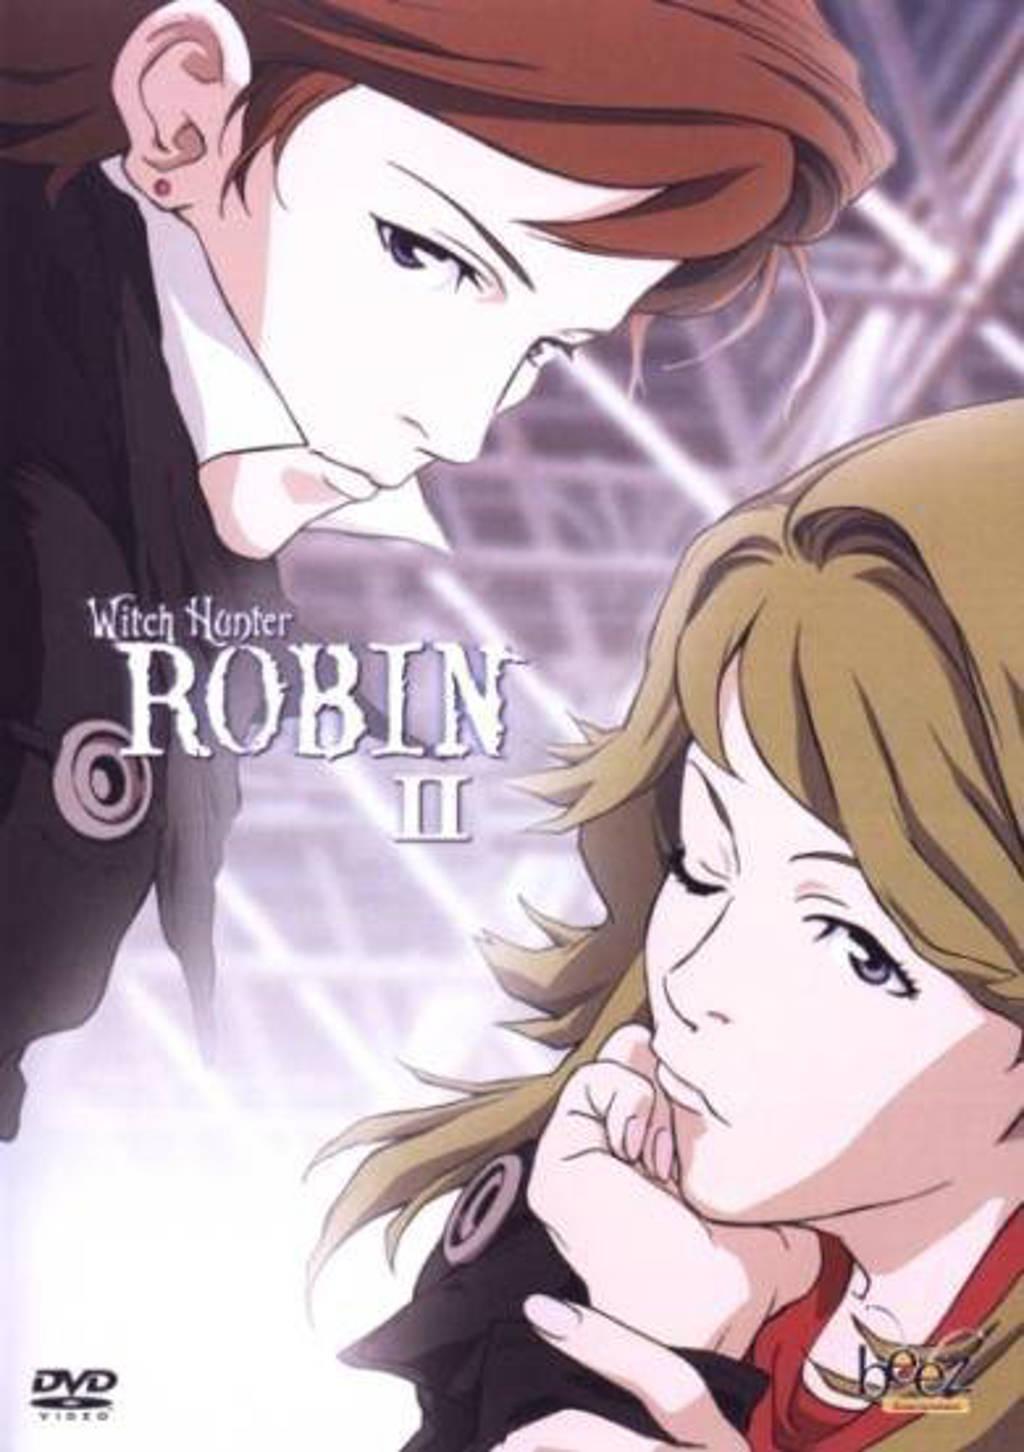 Witch hunter Robin 2 (DVD)